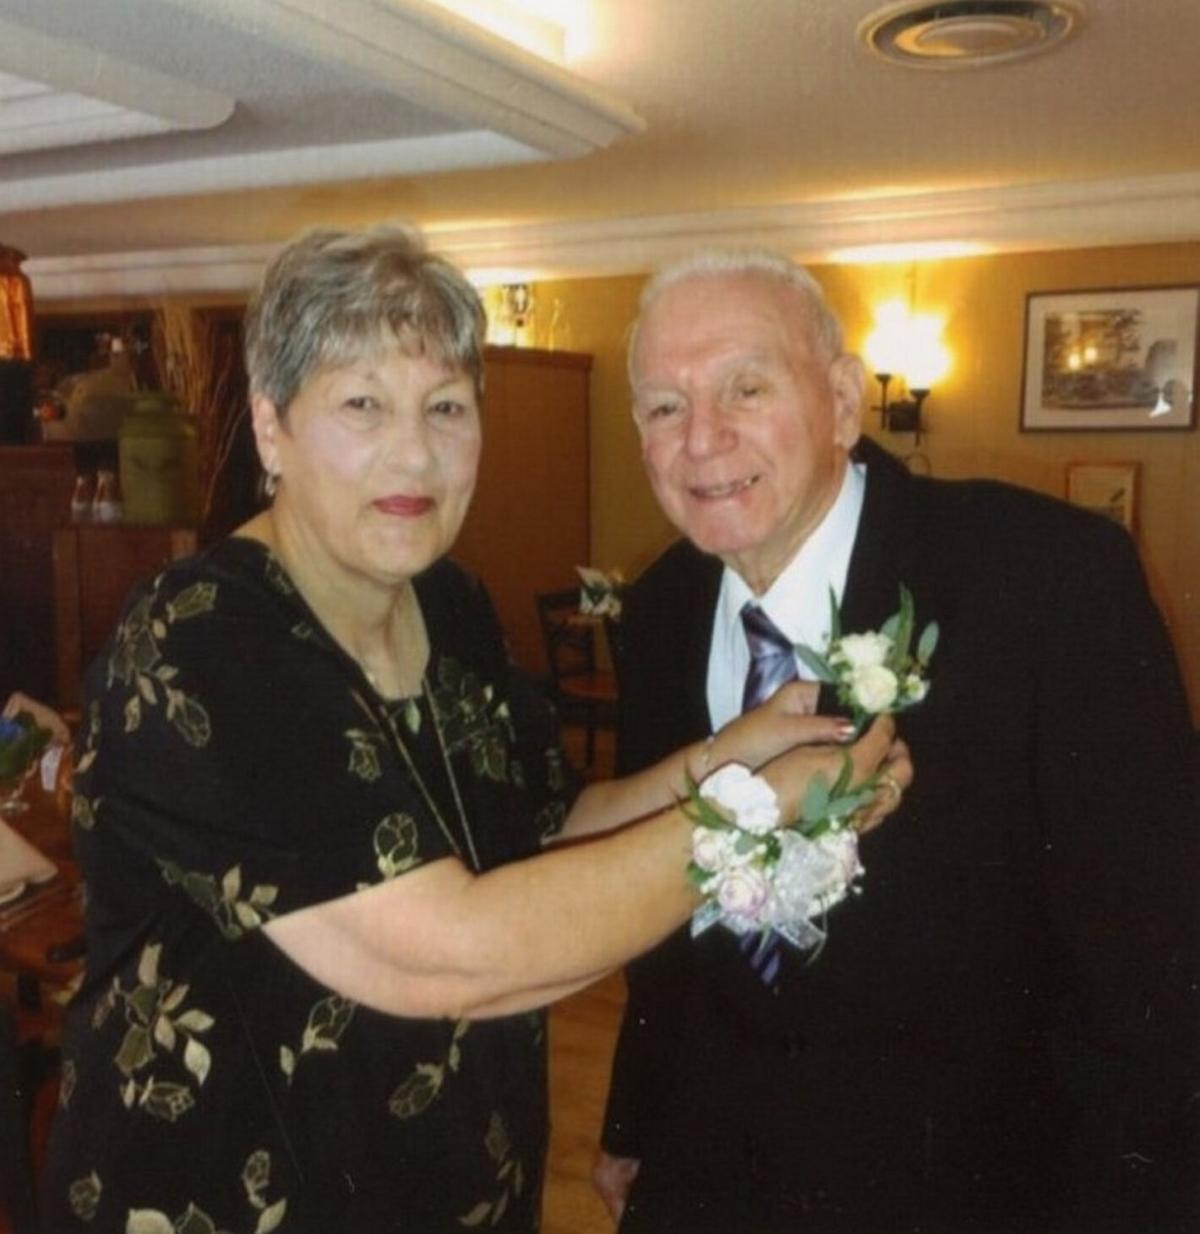 Robert and Suzanne Berardini